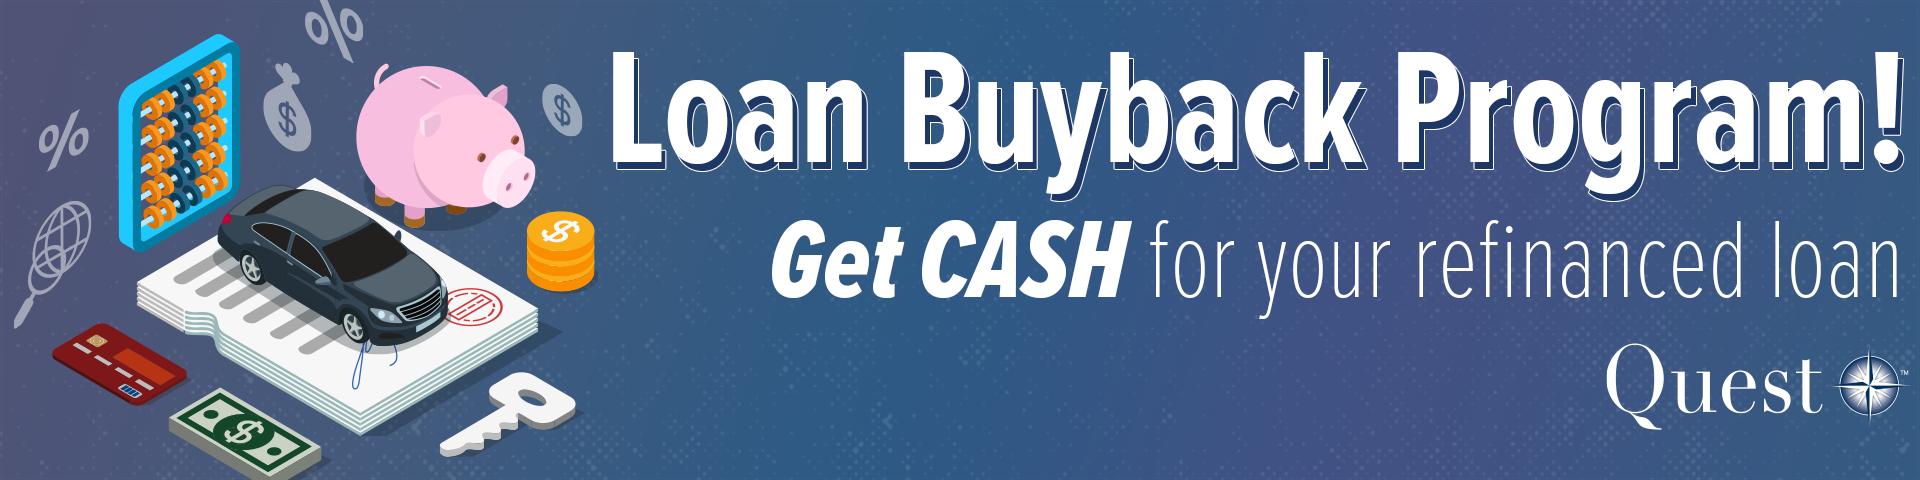 Loan Buyback